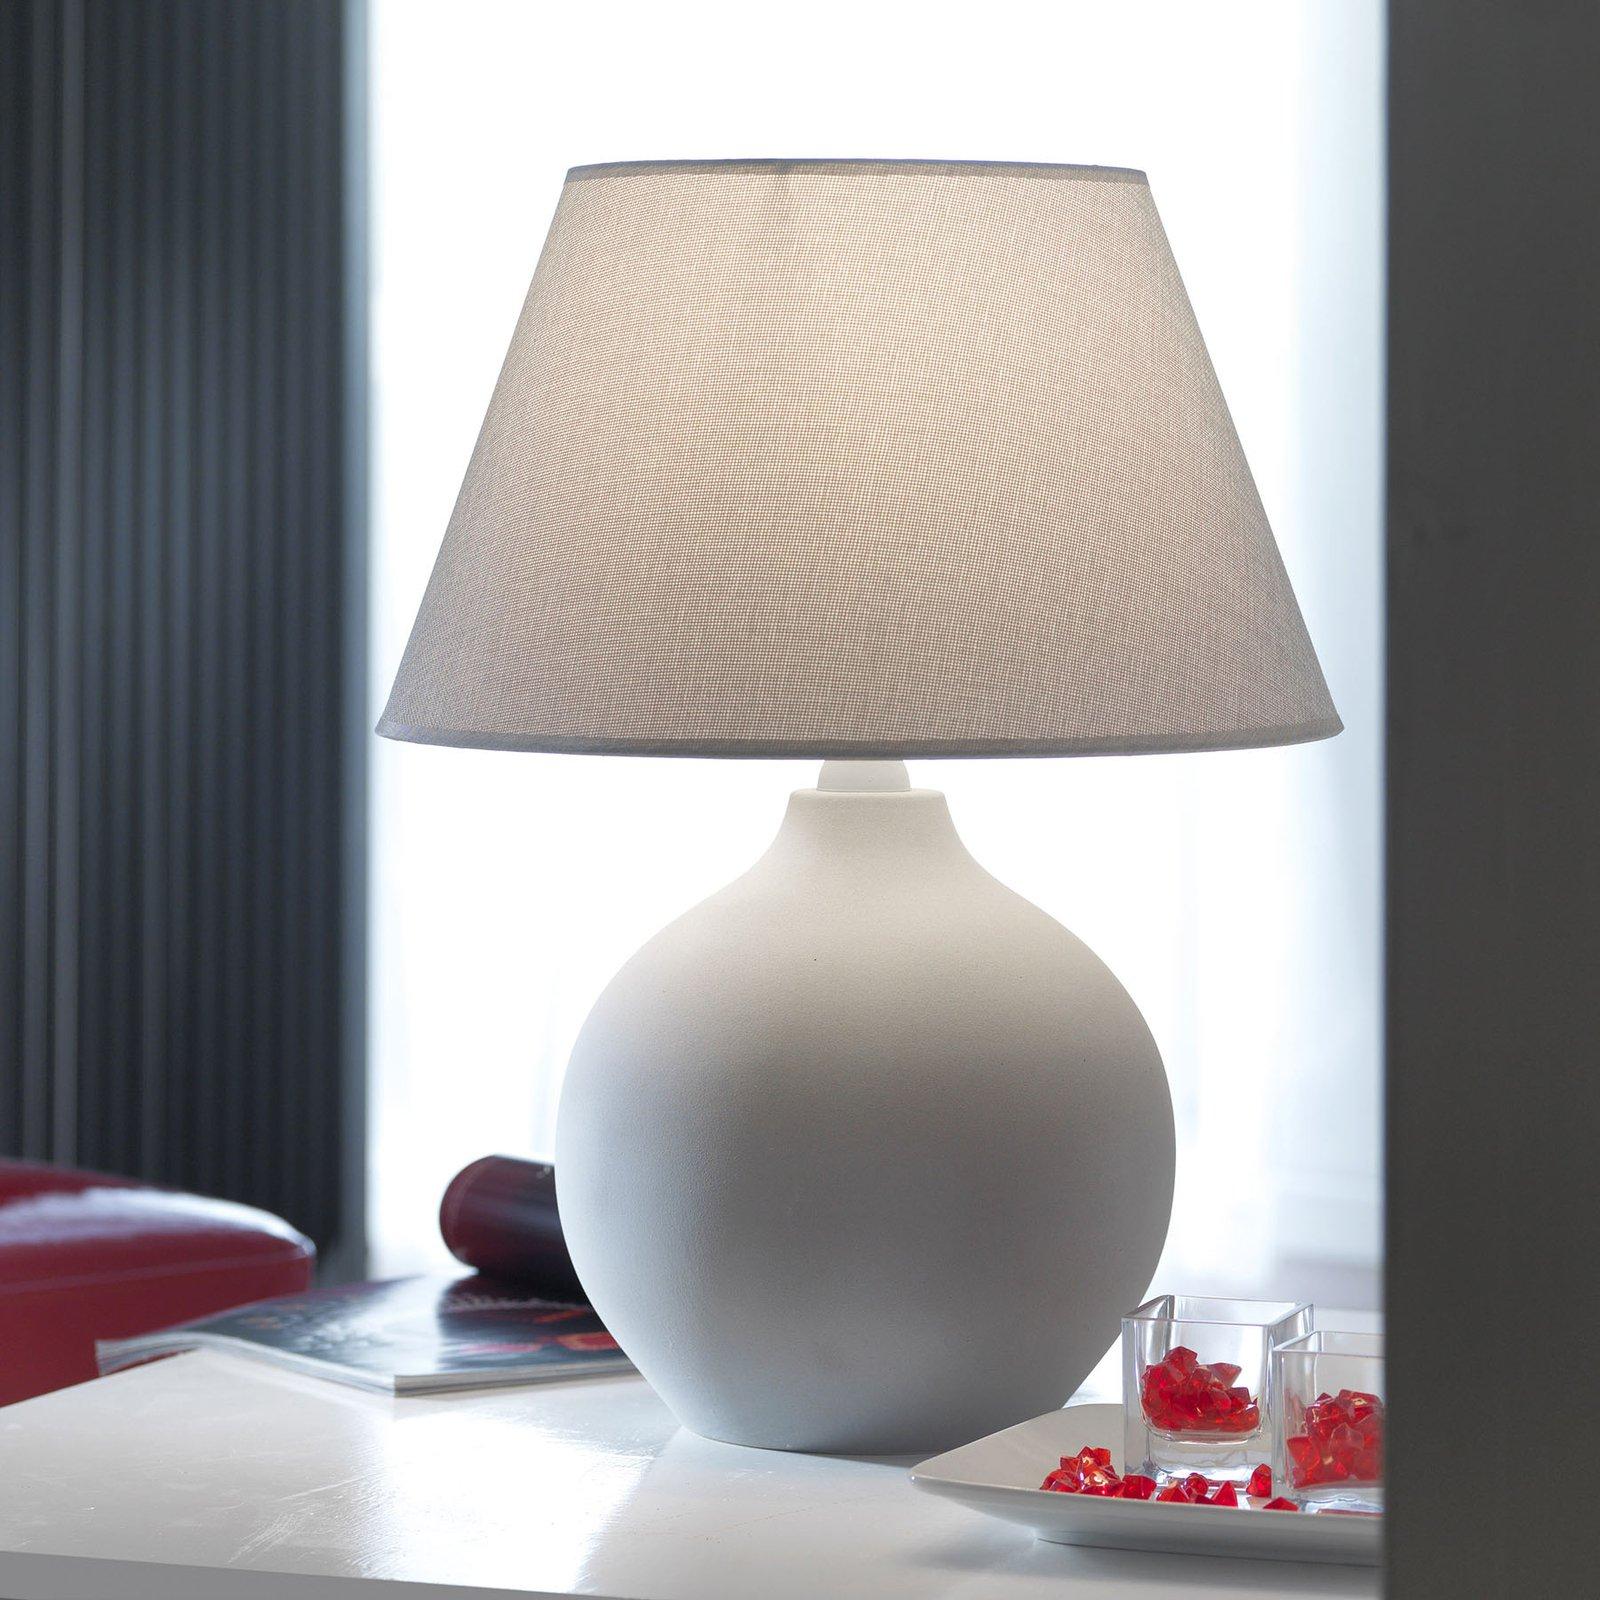 Bordlampe Sfera, høyde 53 cm, sement/grå